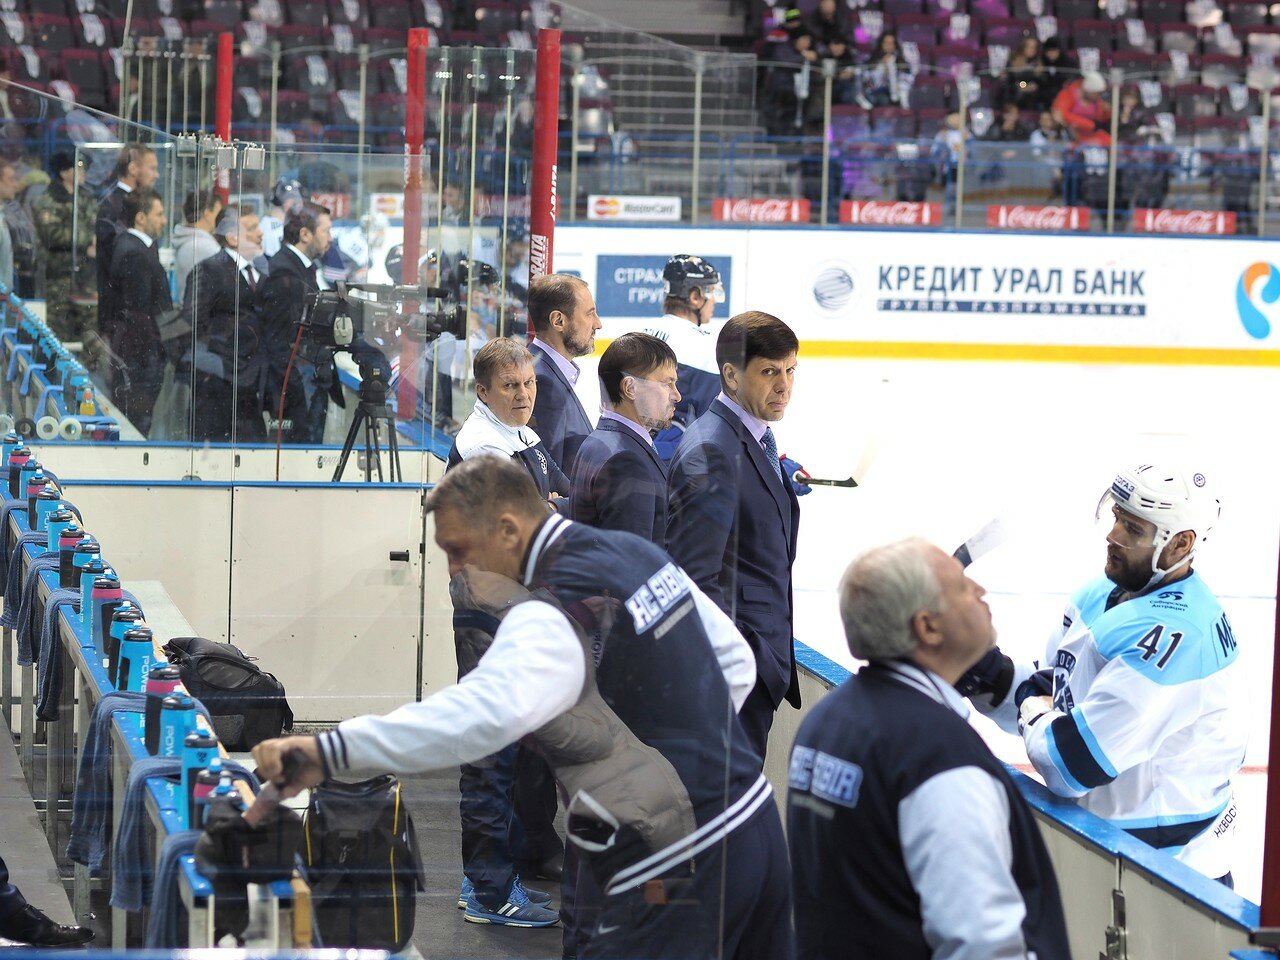 9Плей-офф 2016 Восток 1/2 Металлург - Сибирь 16.03.2016